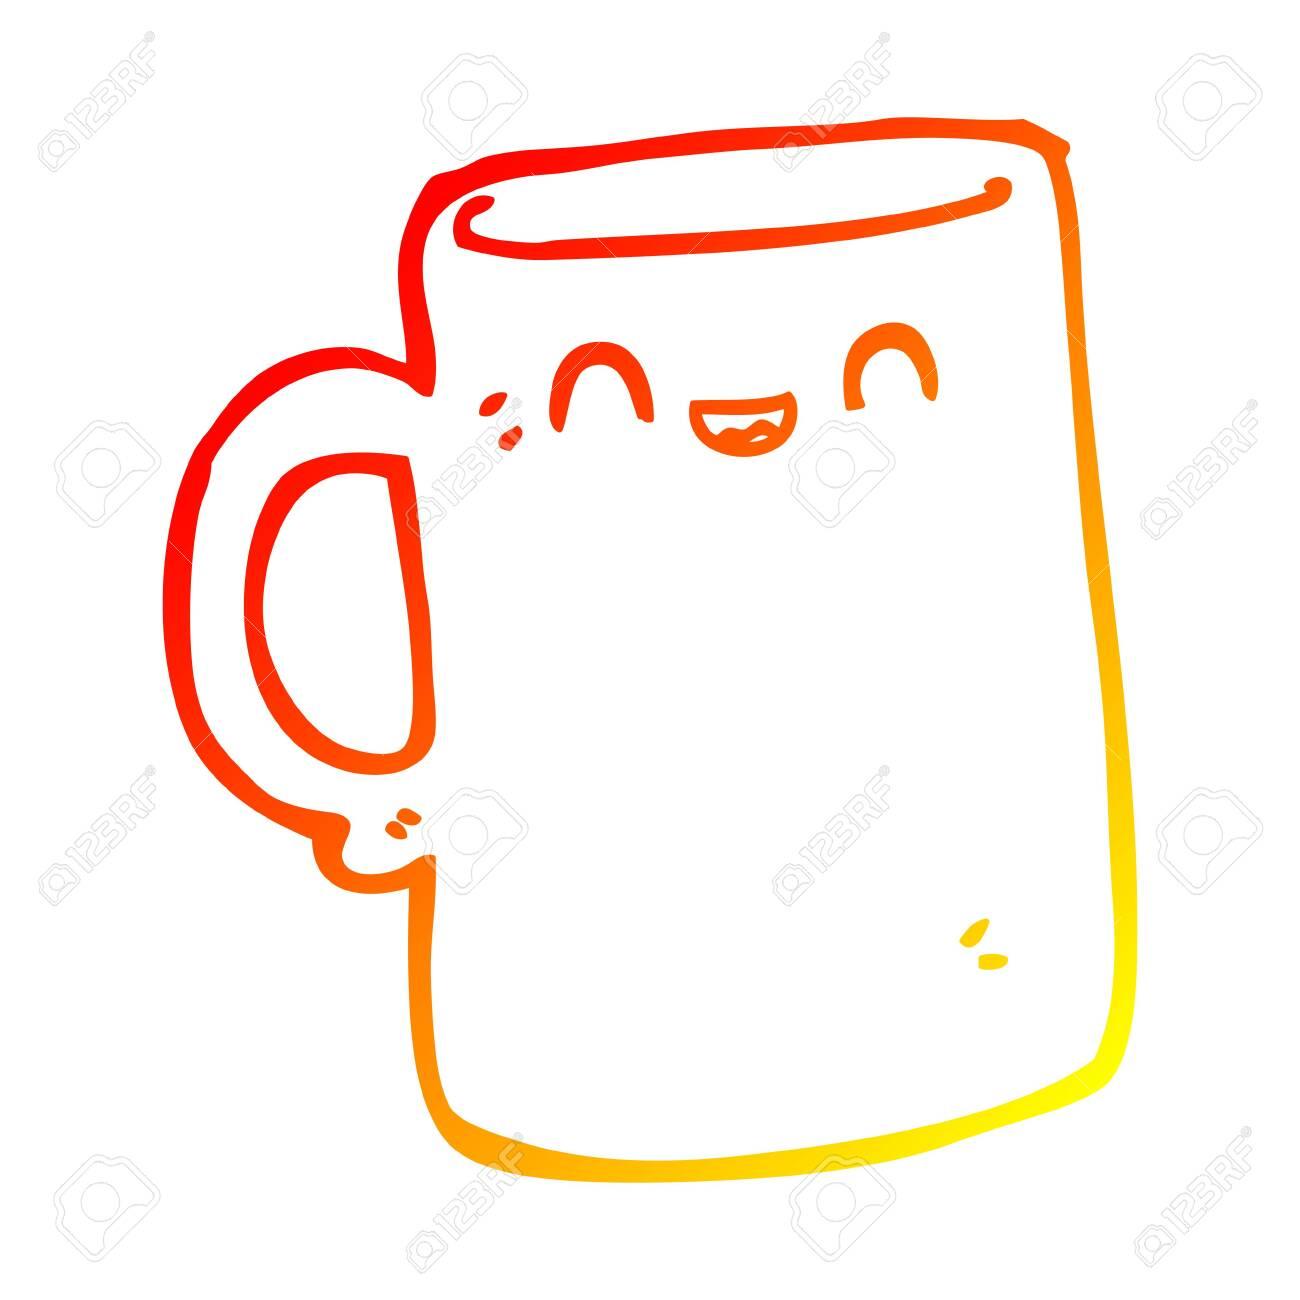 Warm Gradient Line Drawing Of A Cartoon Mug Royalty Free Cliparts Vectors And Stock Illustration Image 129355826